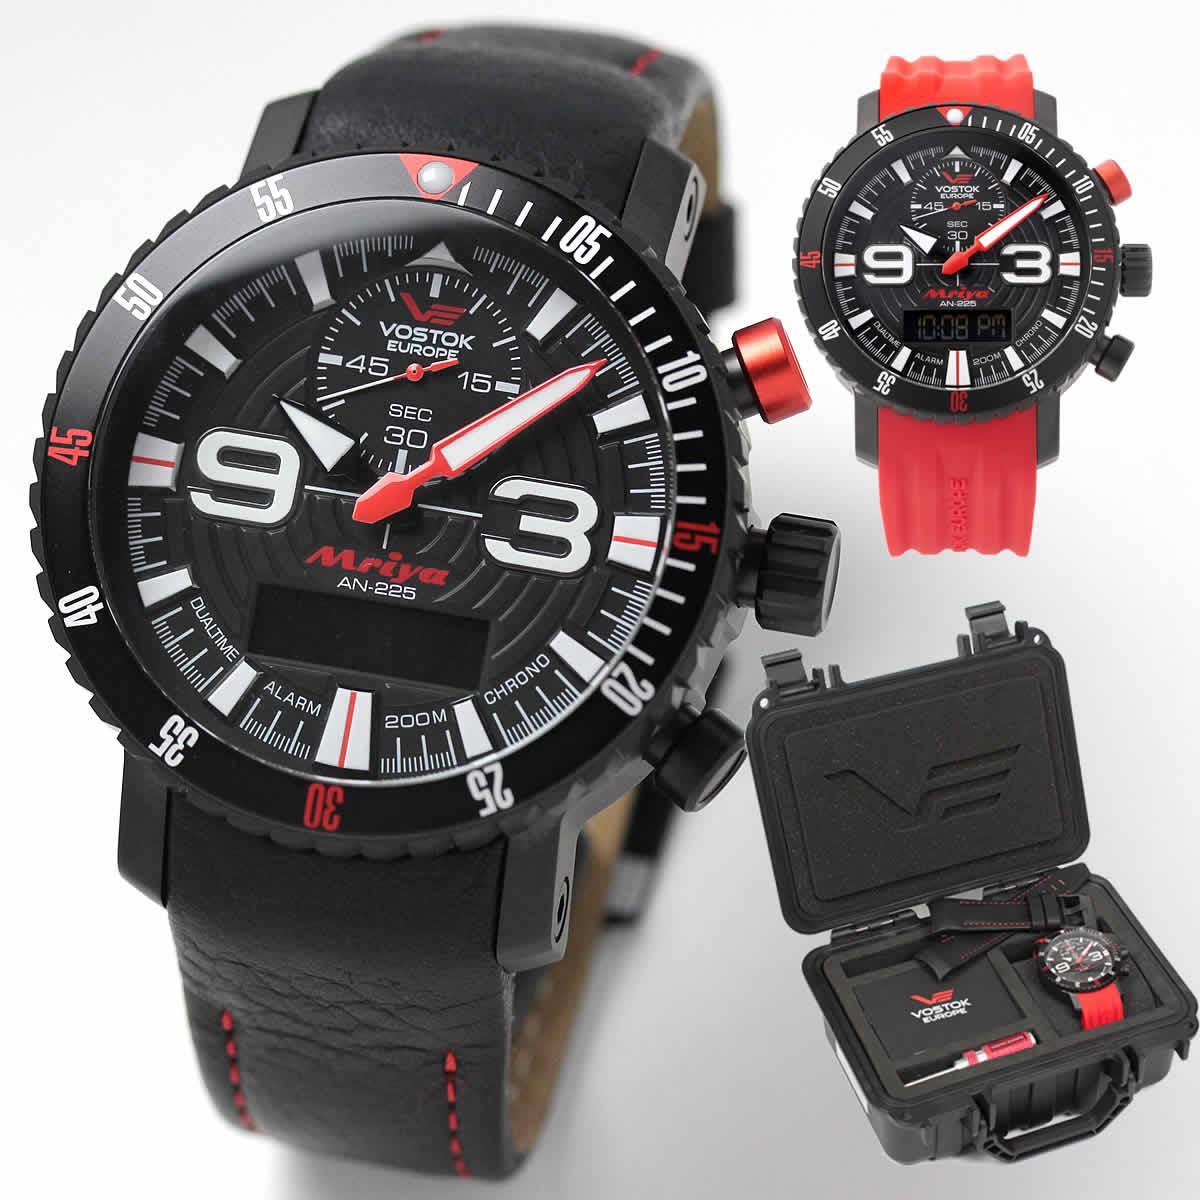 VOSTOK EUROPE/ボストークヨーロッパ/MRIYA 多機能クォーツ式/9516-5554250 腕時計